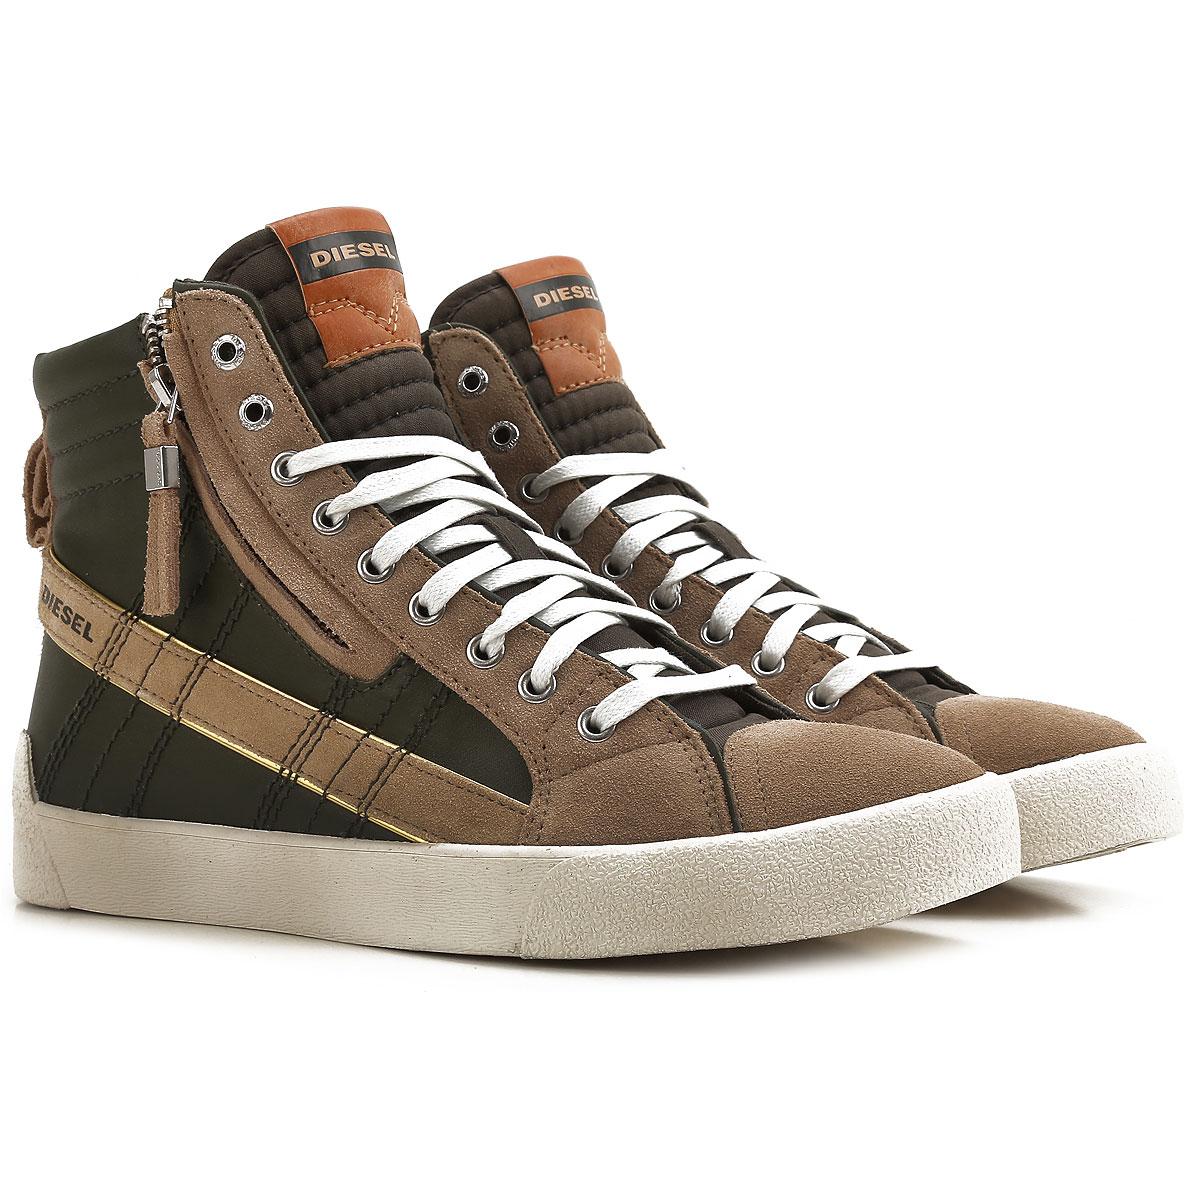 chaussures homme diesel code produit y01169 p1204 h6368. Black Bedroom Furniture Sets. Home Design Ideas